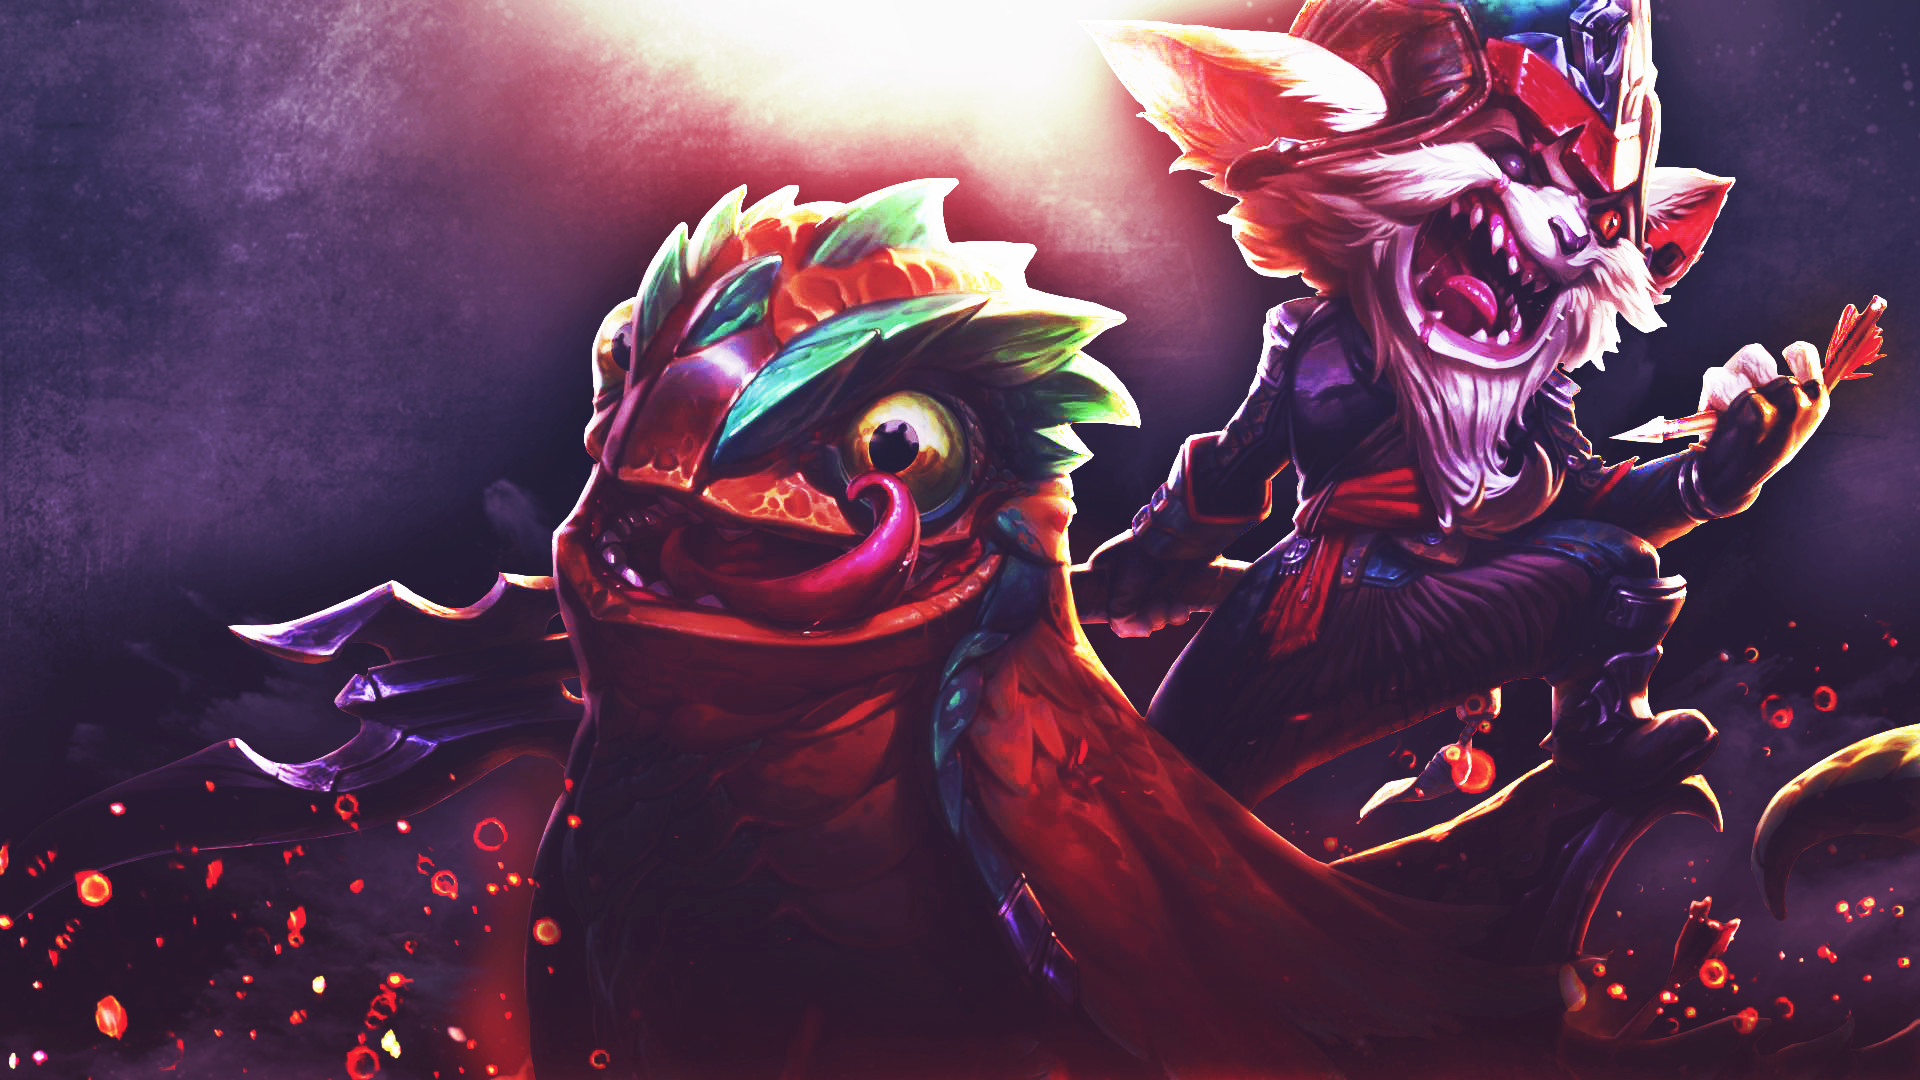 Video Game – League Of Legends Kled (League Of Legends) Wallpaper